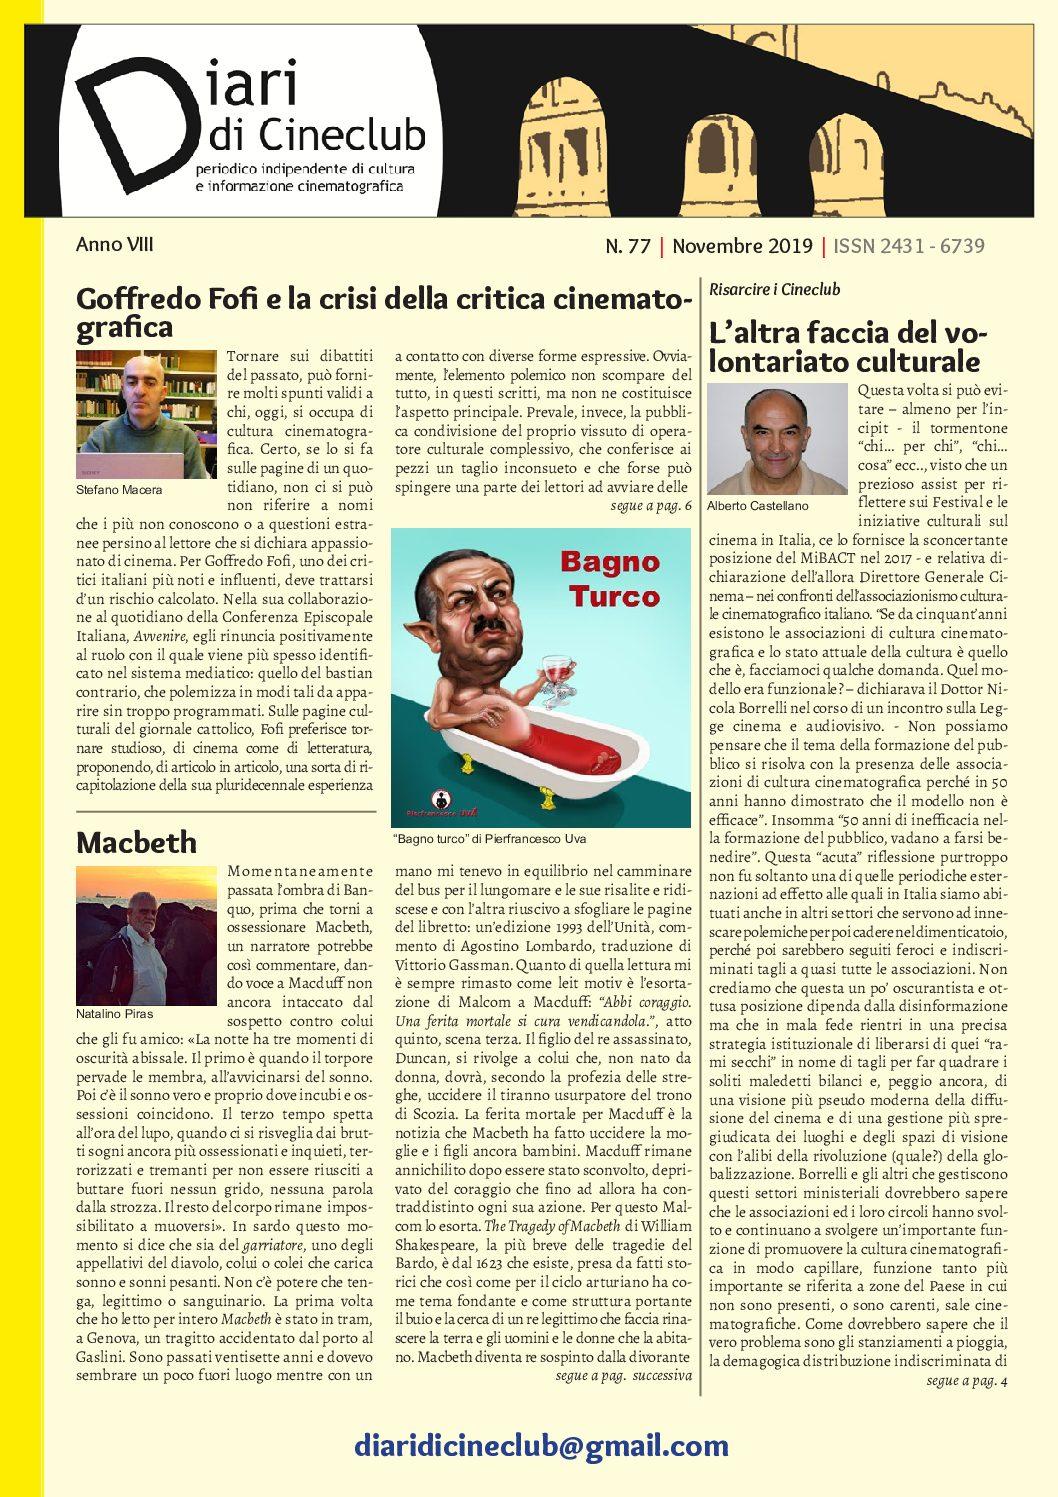 Online Diari di Cineclub n°77 – Novembre